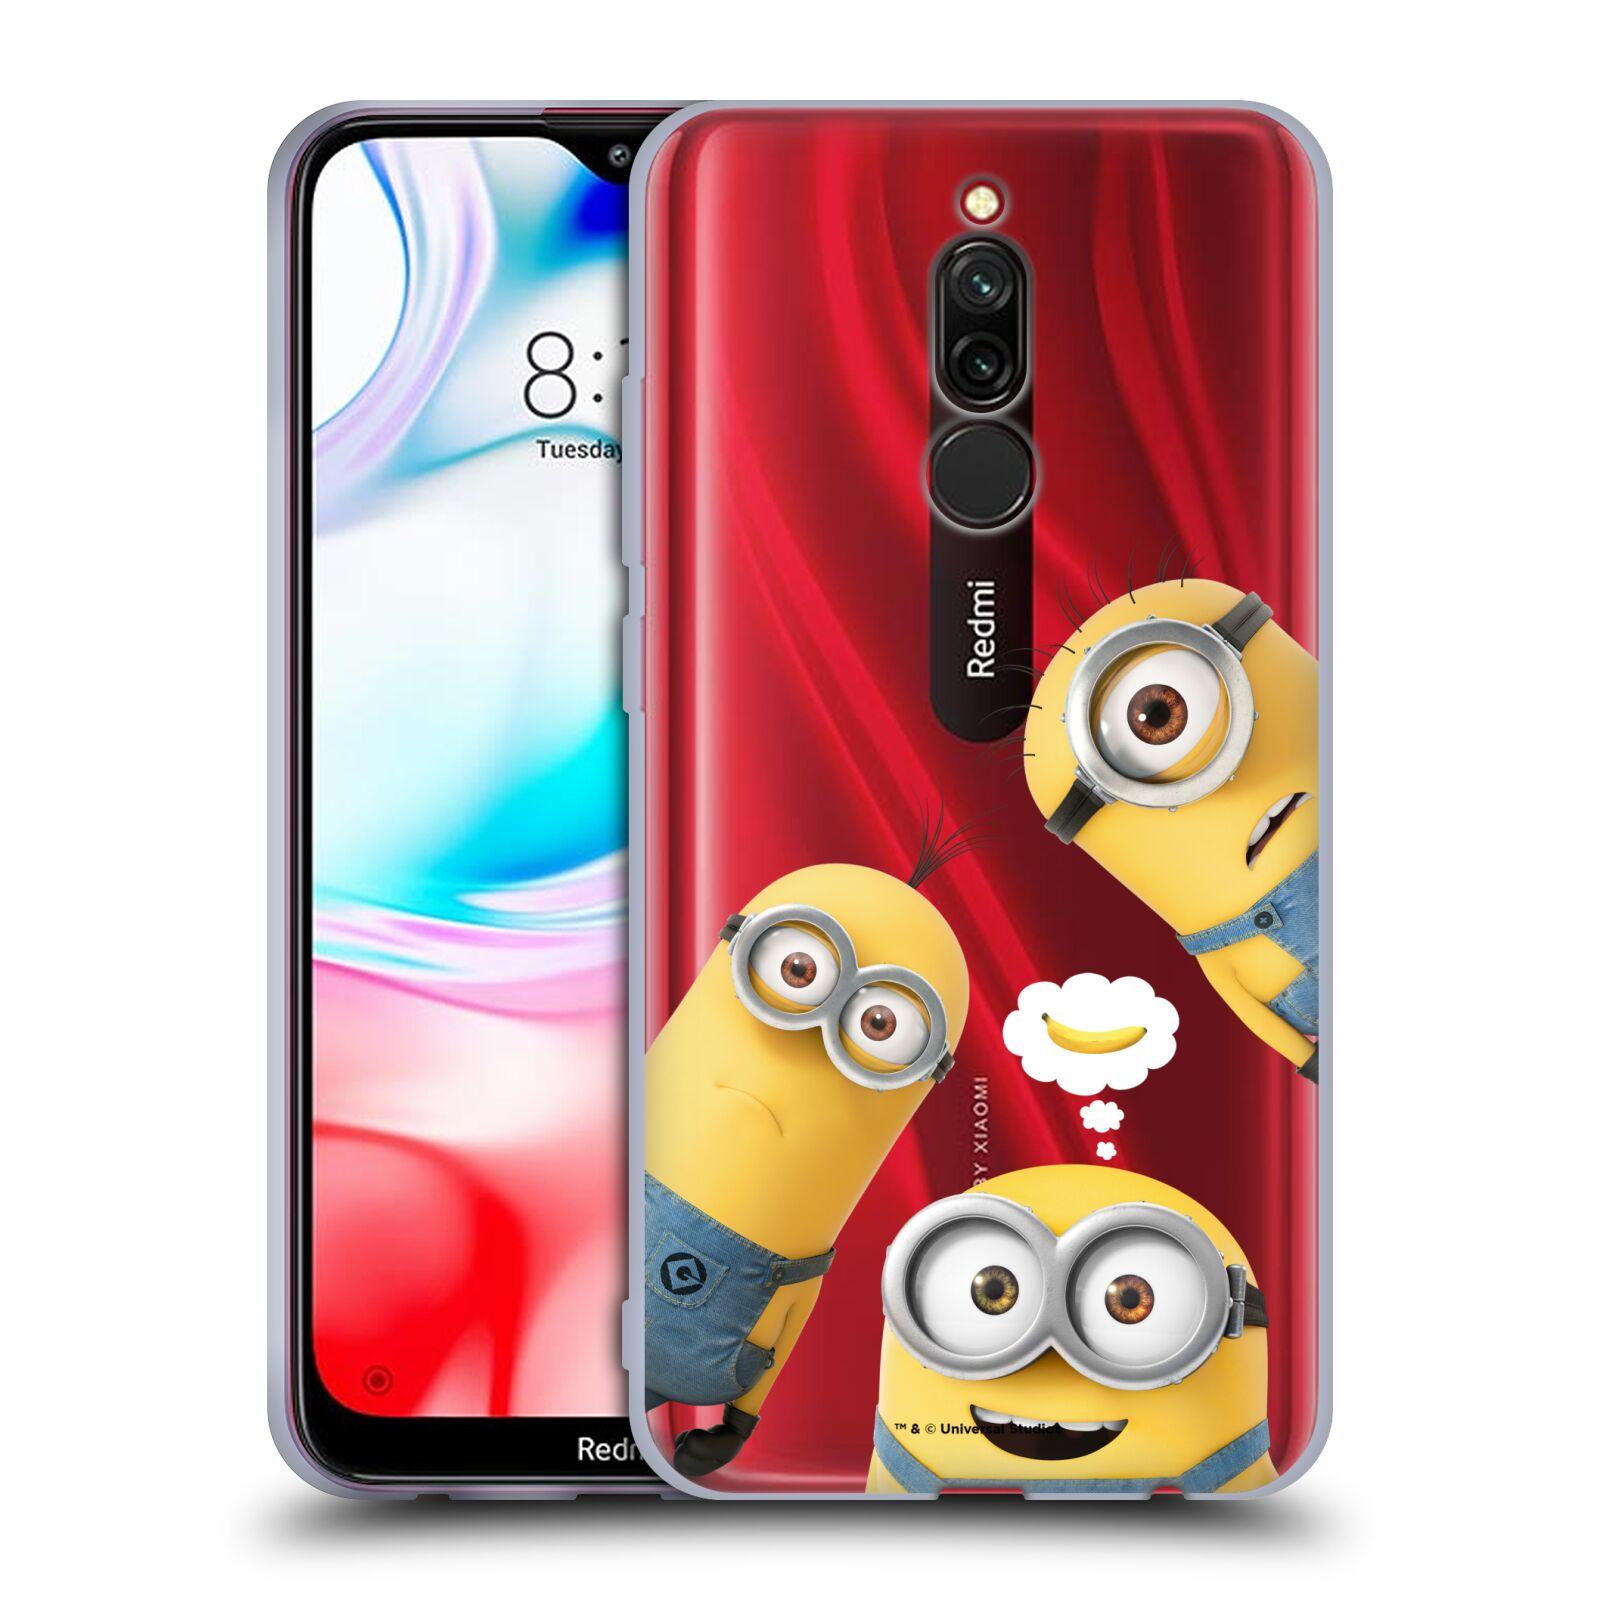 Silikonové pouzdro na mobil Xiaomi Redmi 8 - Head Case - Mimoni Banana z filmu Já, padouch - Despicable Me